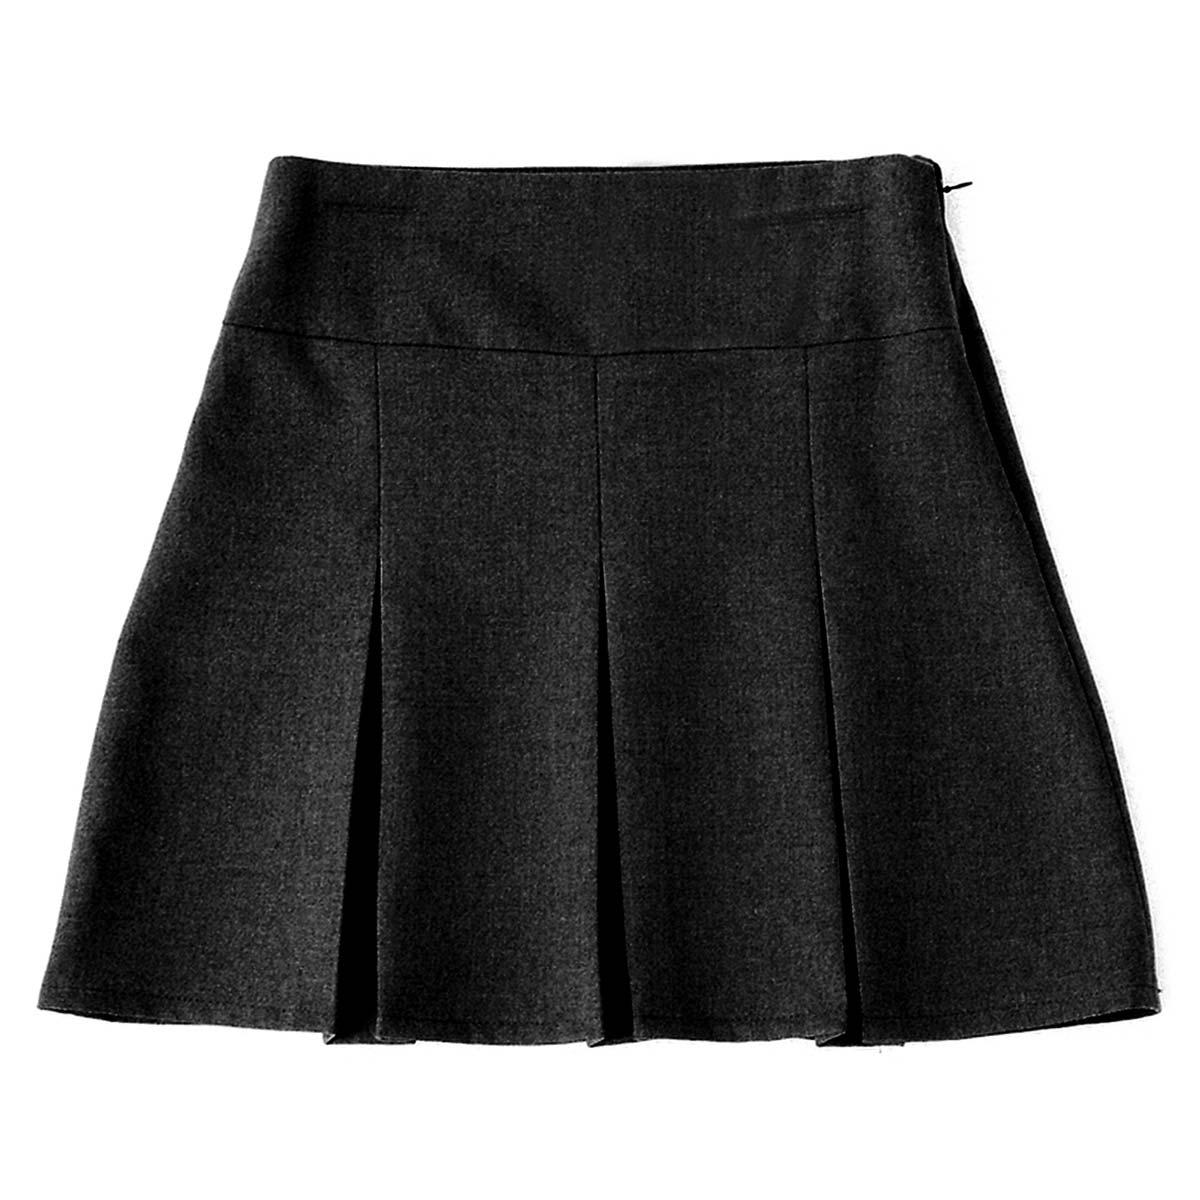 Girls 6-Pleat School Skirt - Secondary CSKG05